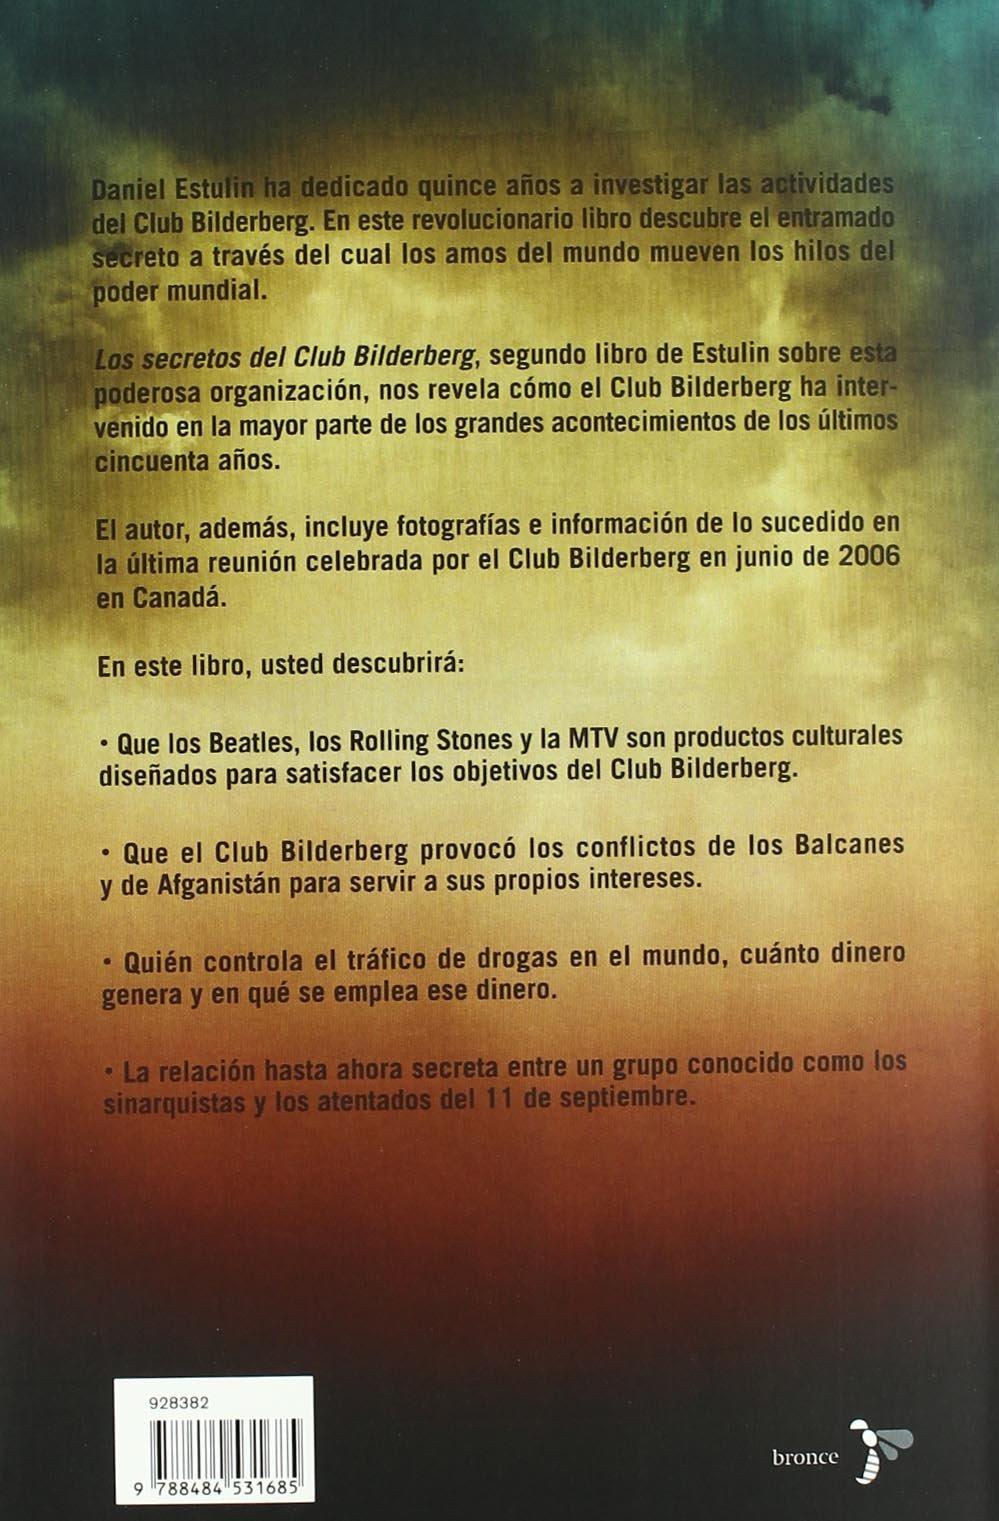 Los secretos del club Bilderberg (Spanish Edition): Daniel Estulin ...